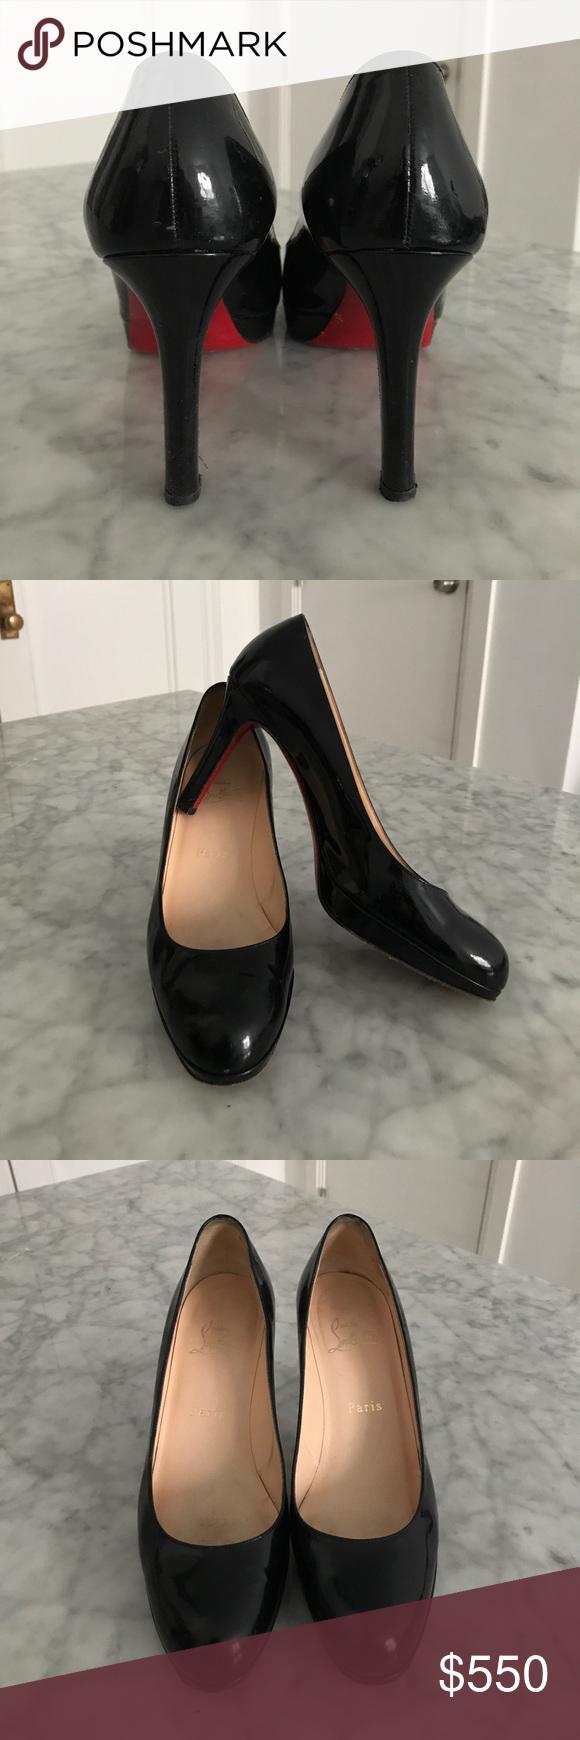 promo code 3873c 8c5ab Christian Louboutin Shoes | Christian Louboutin Simple Pump ...